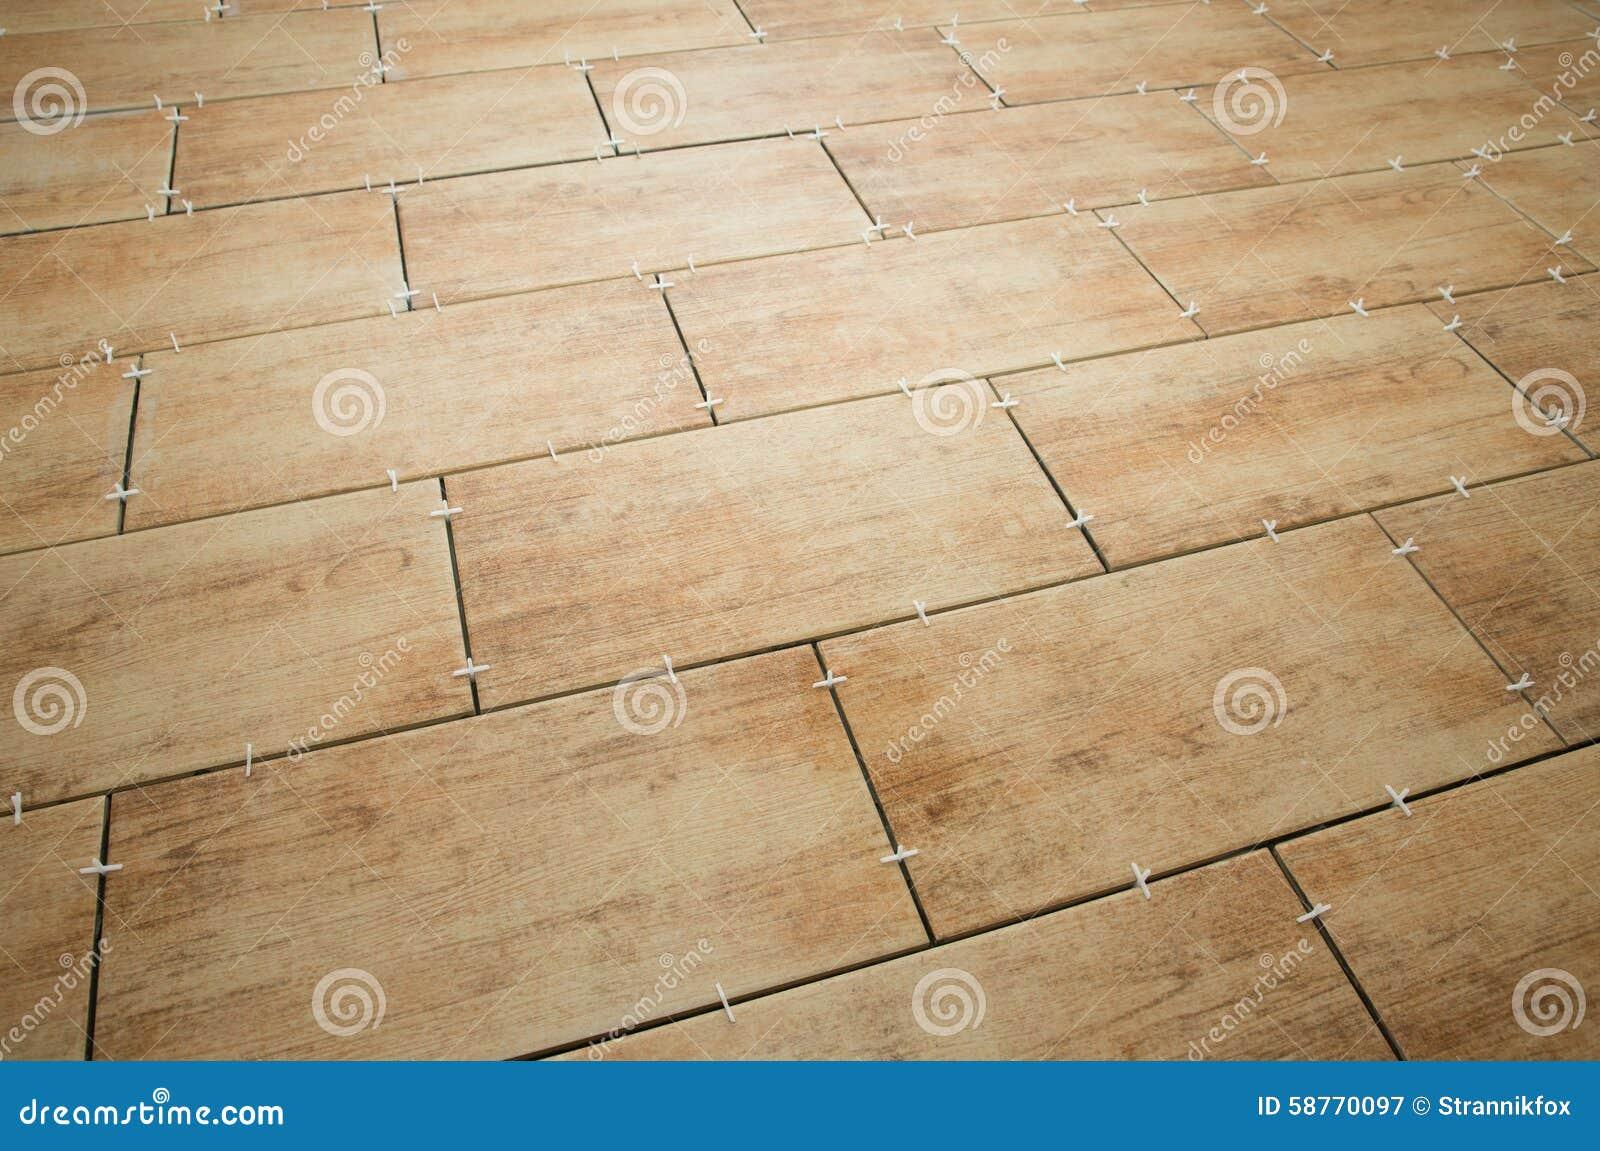 Laying Ceramic Floor Tiles Royalty Free Stock Image 33647620